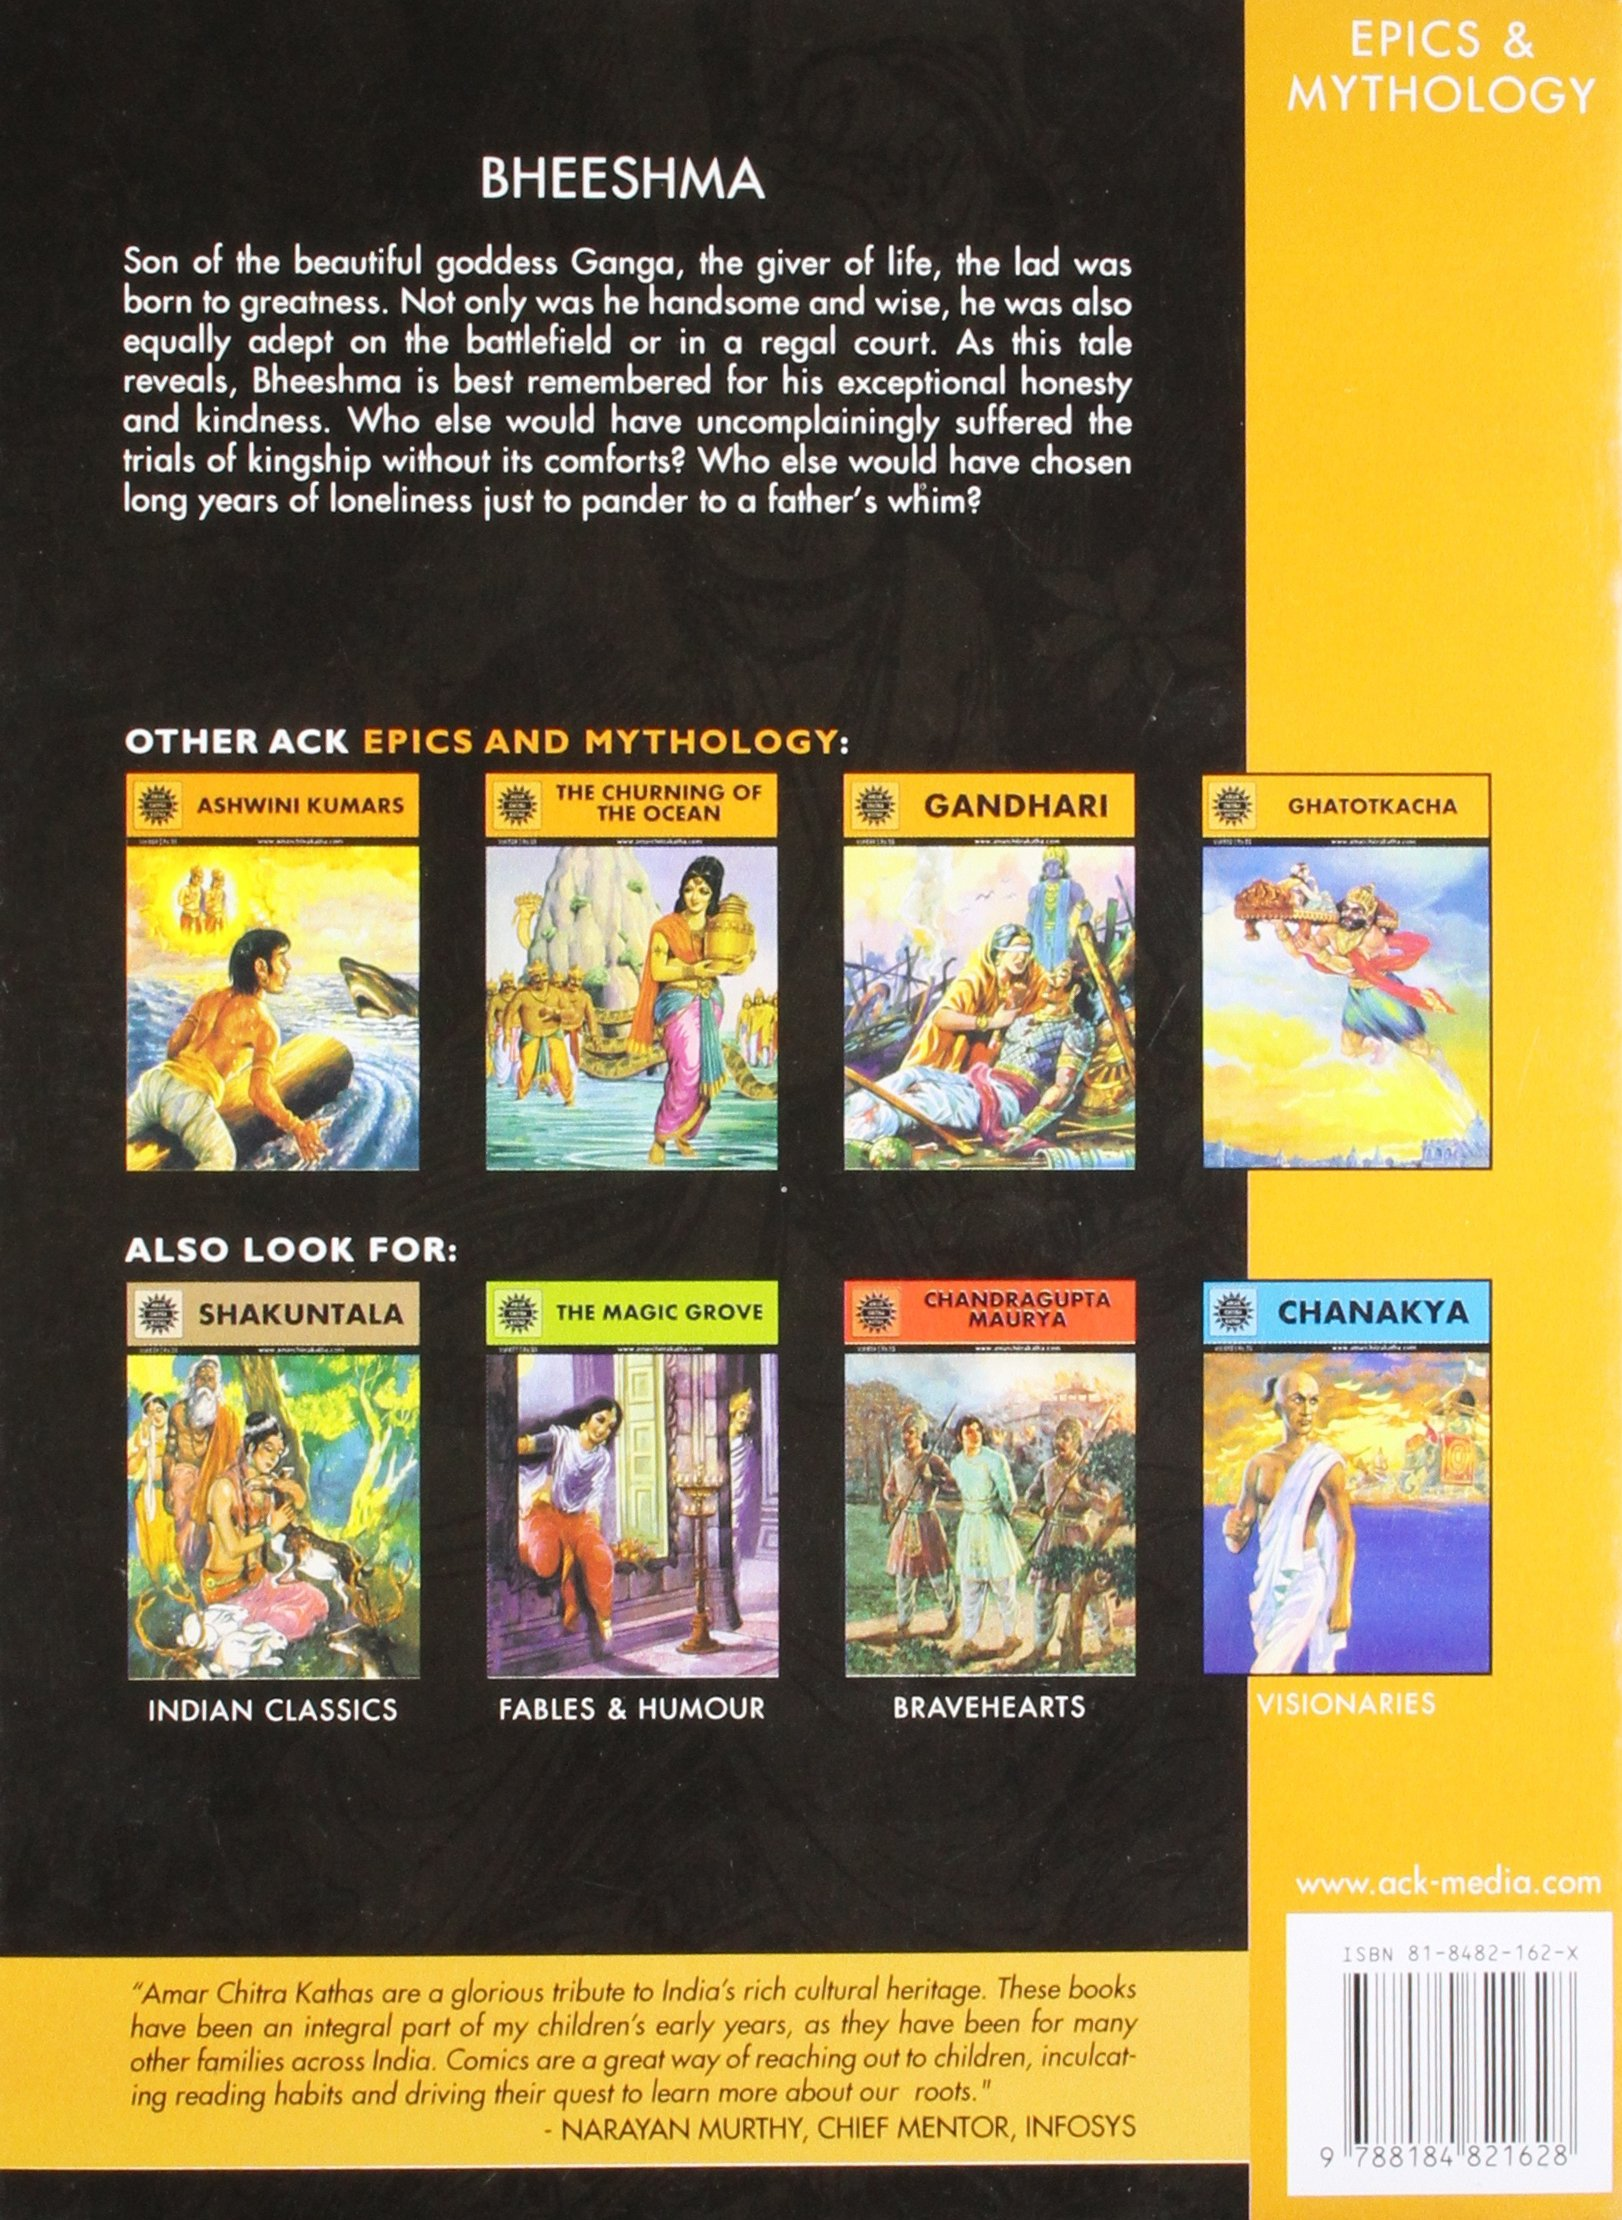 Buy Bheeshma Amar Chitra Katha Book Online At Low Prices In India Bheeshma Amar Chitra Katha Reviews Ratings Amazon In